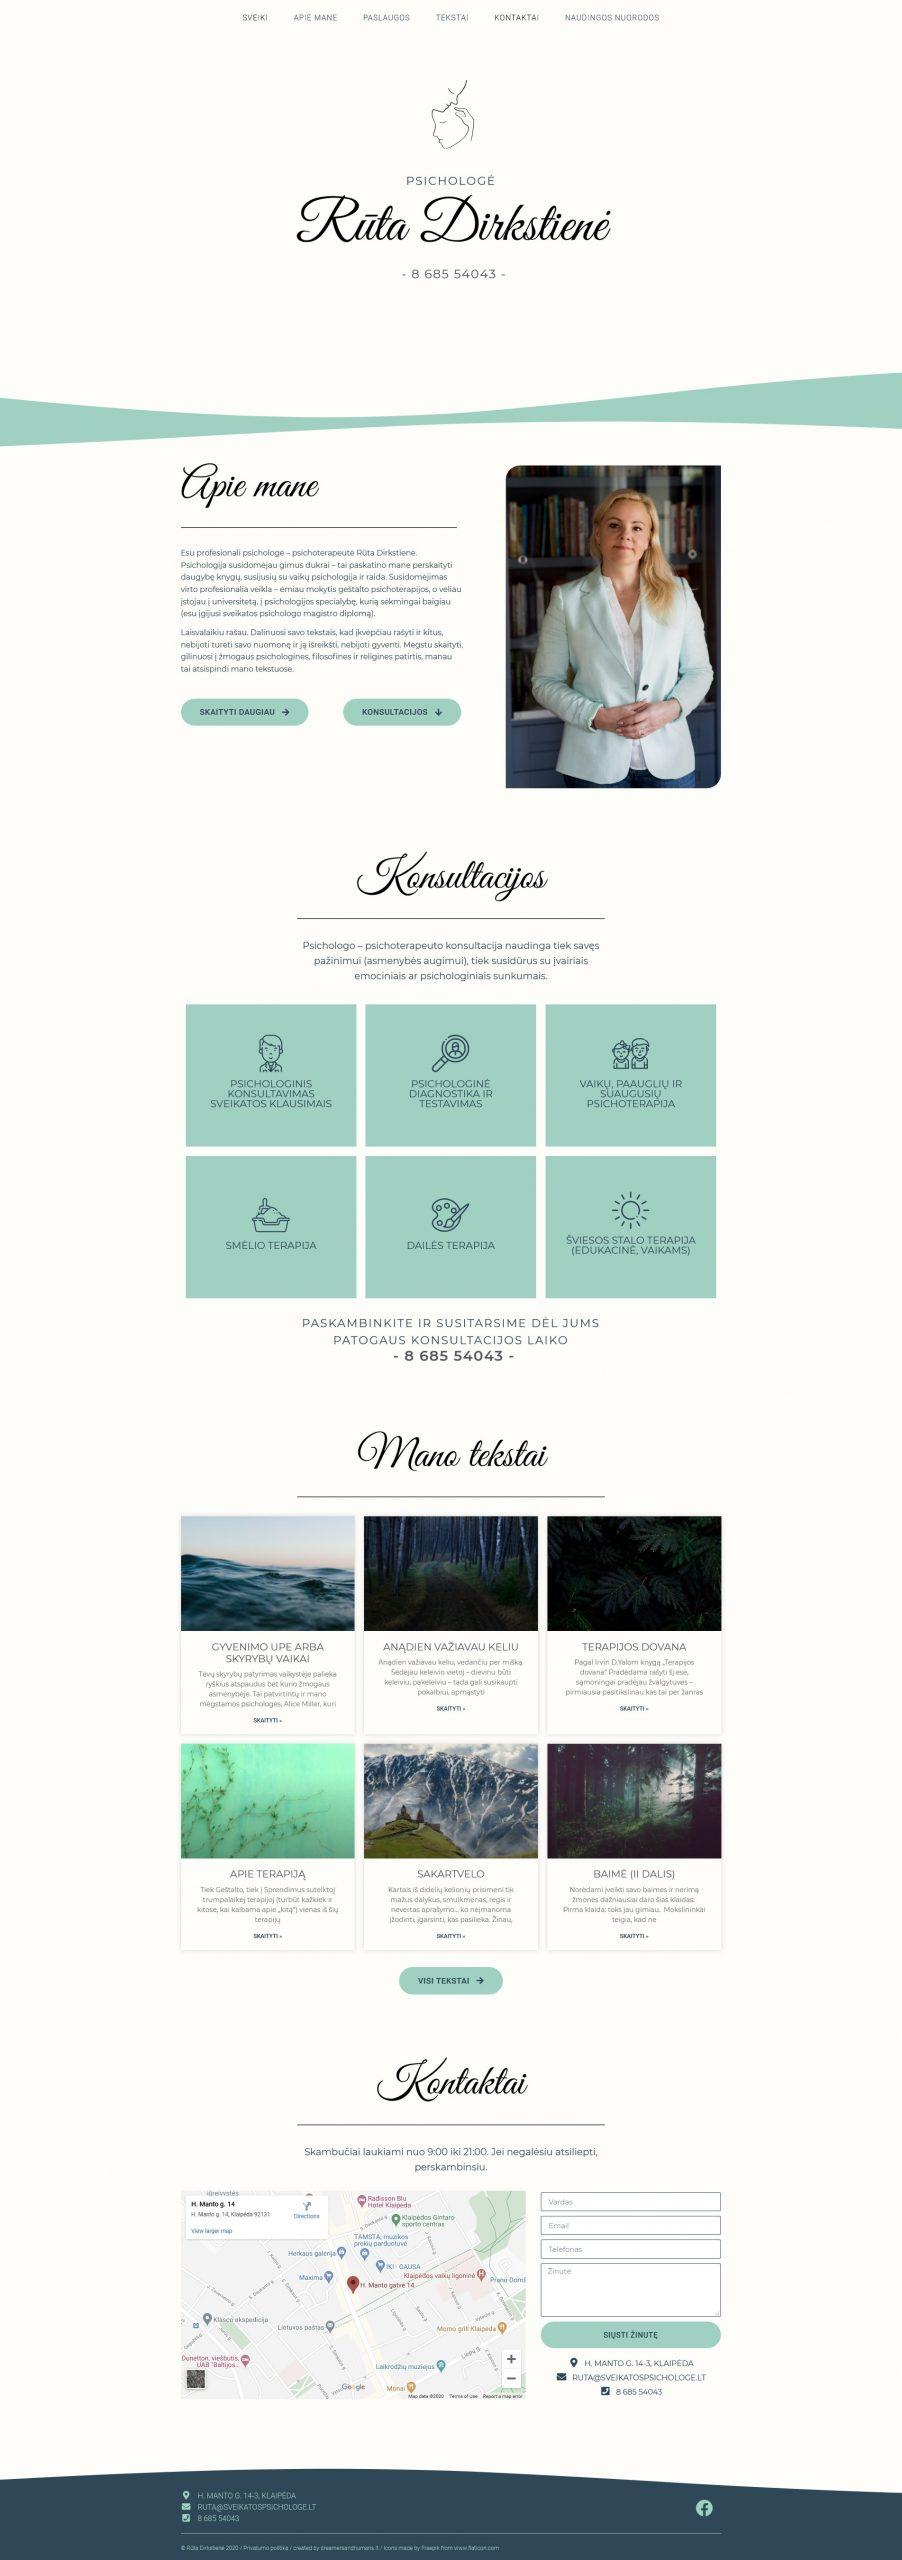 web dizainas 4